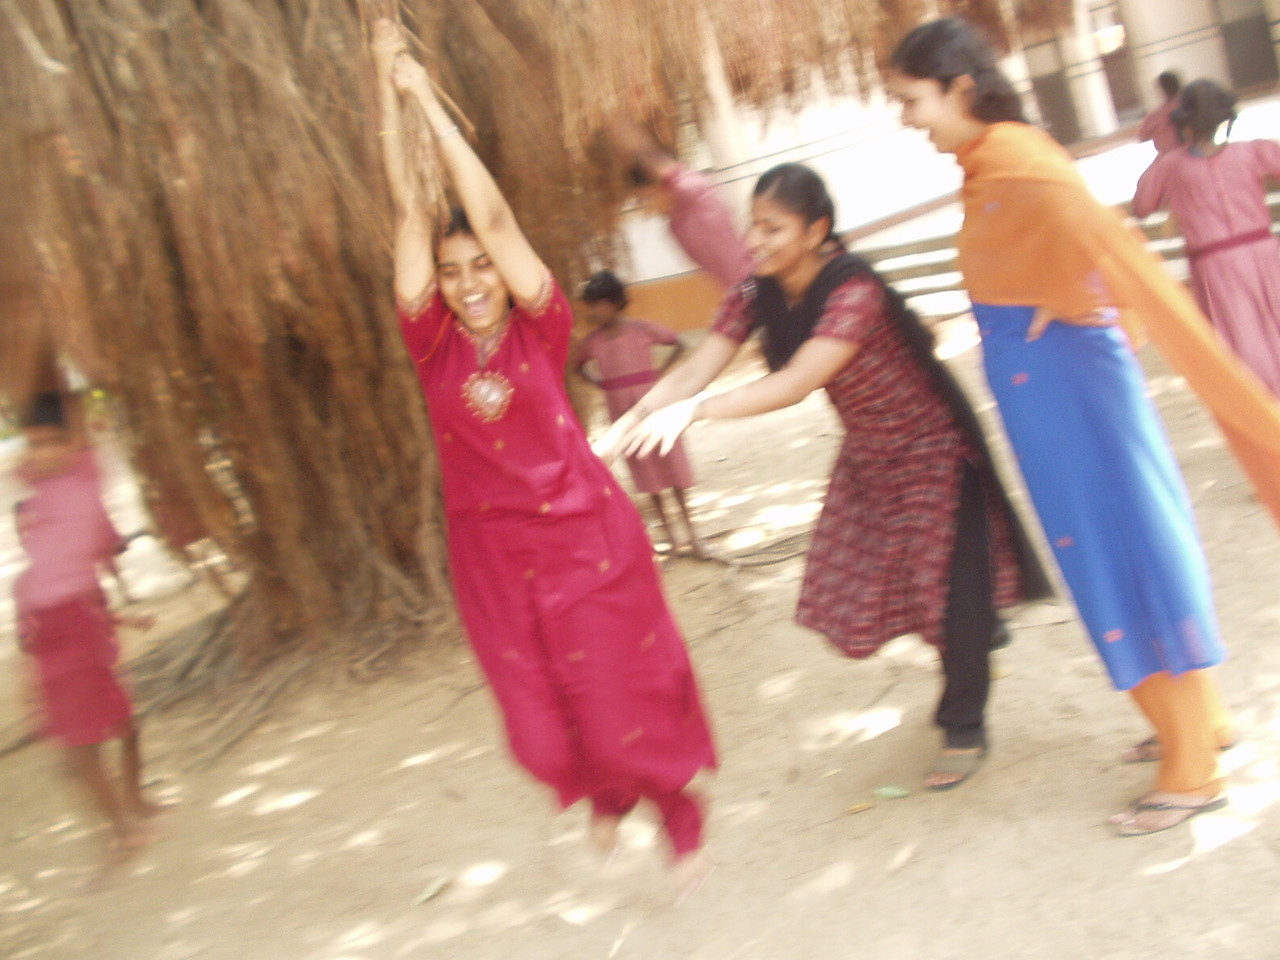 Priya swinging